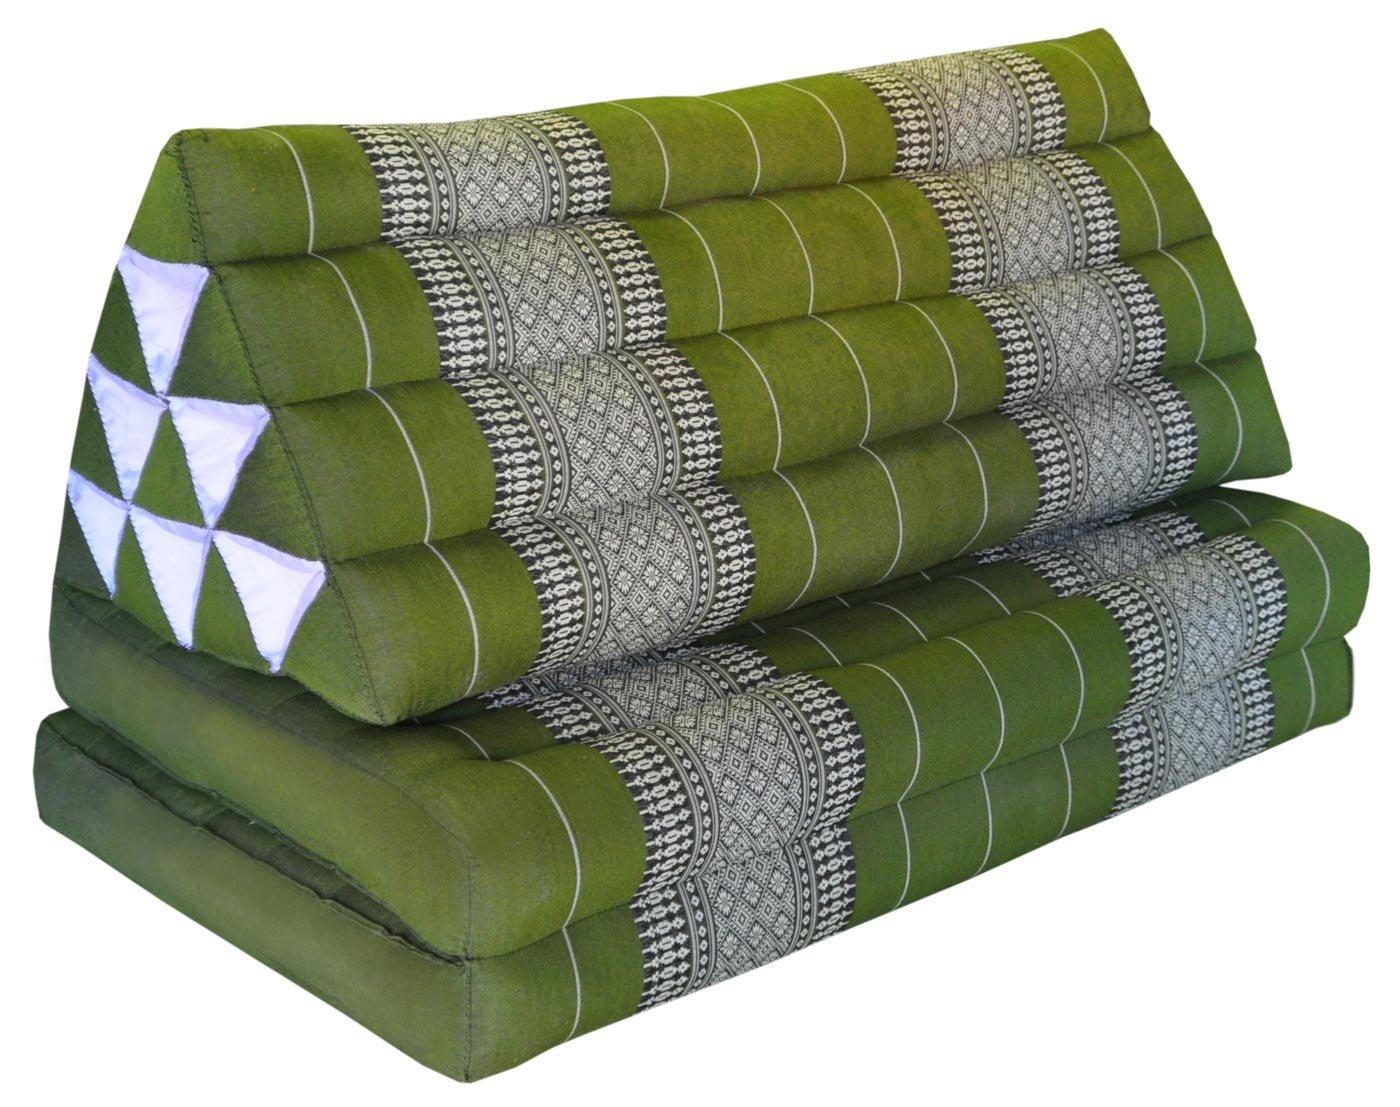 Thai triangle cushion XXL, with 2 folding seats, green, sofa, relaxation, beach, pool, meditation, yoga, made in Thailand. (81817)